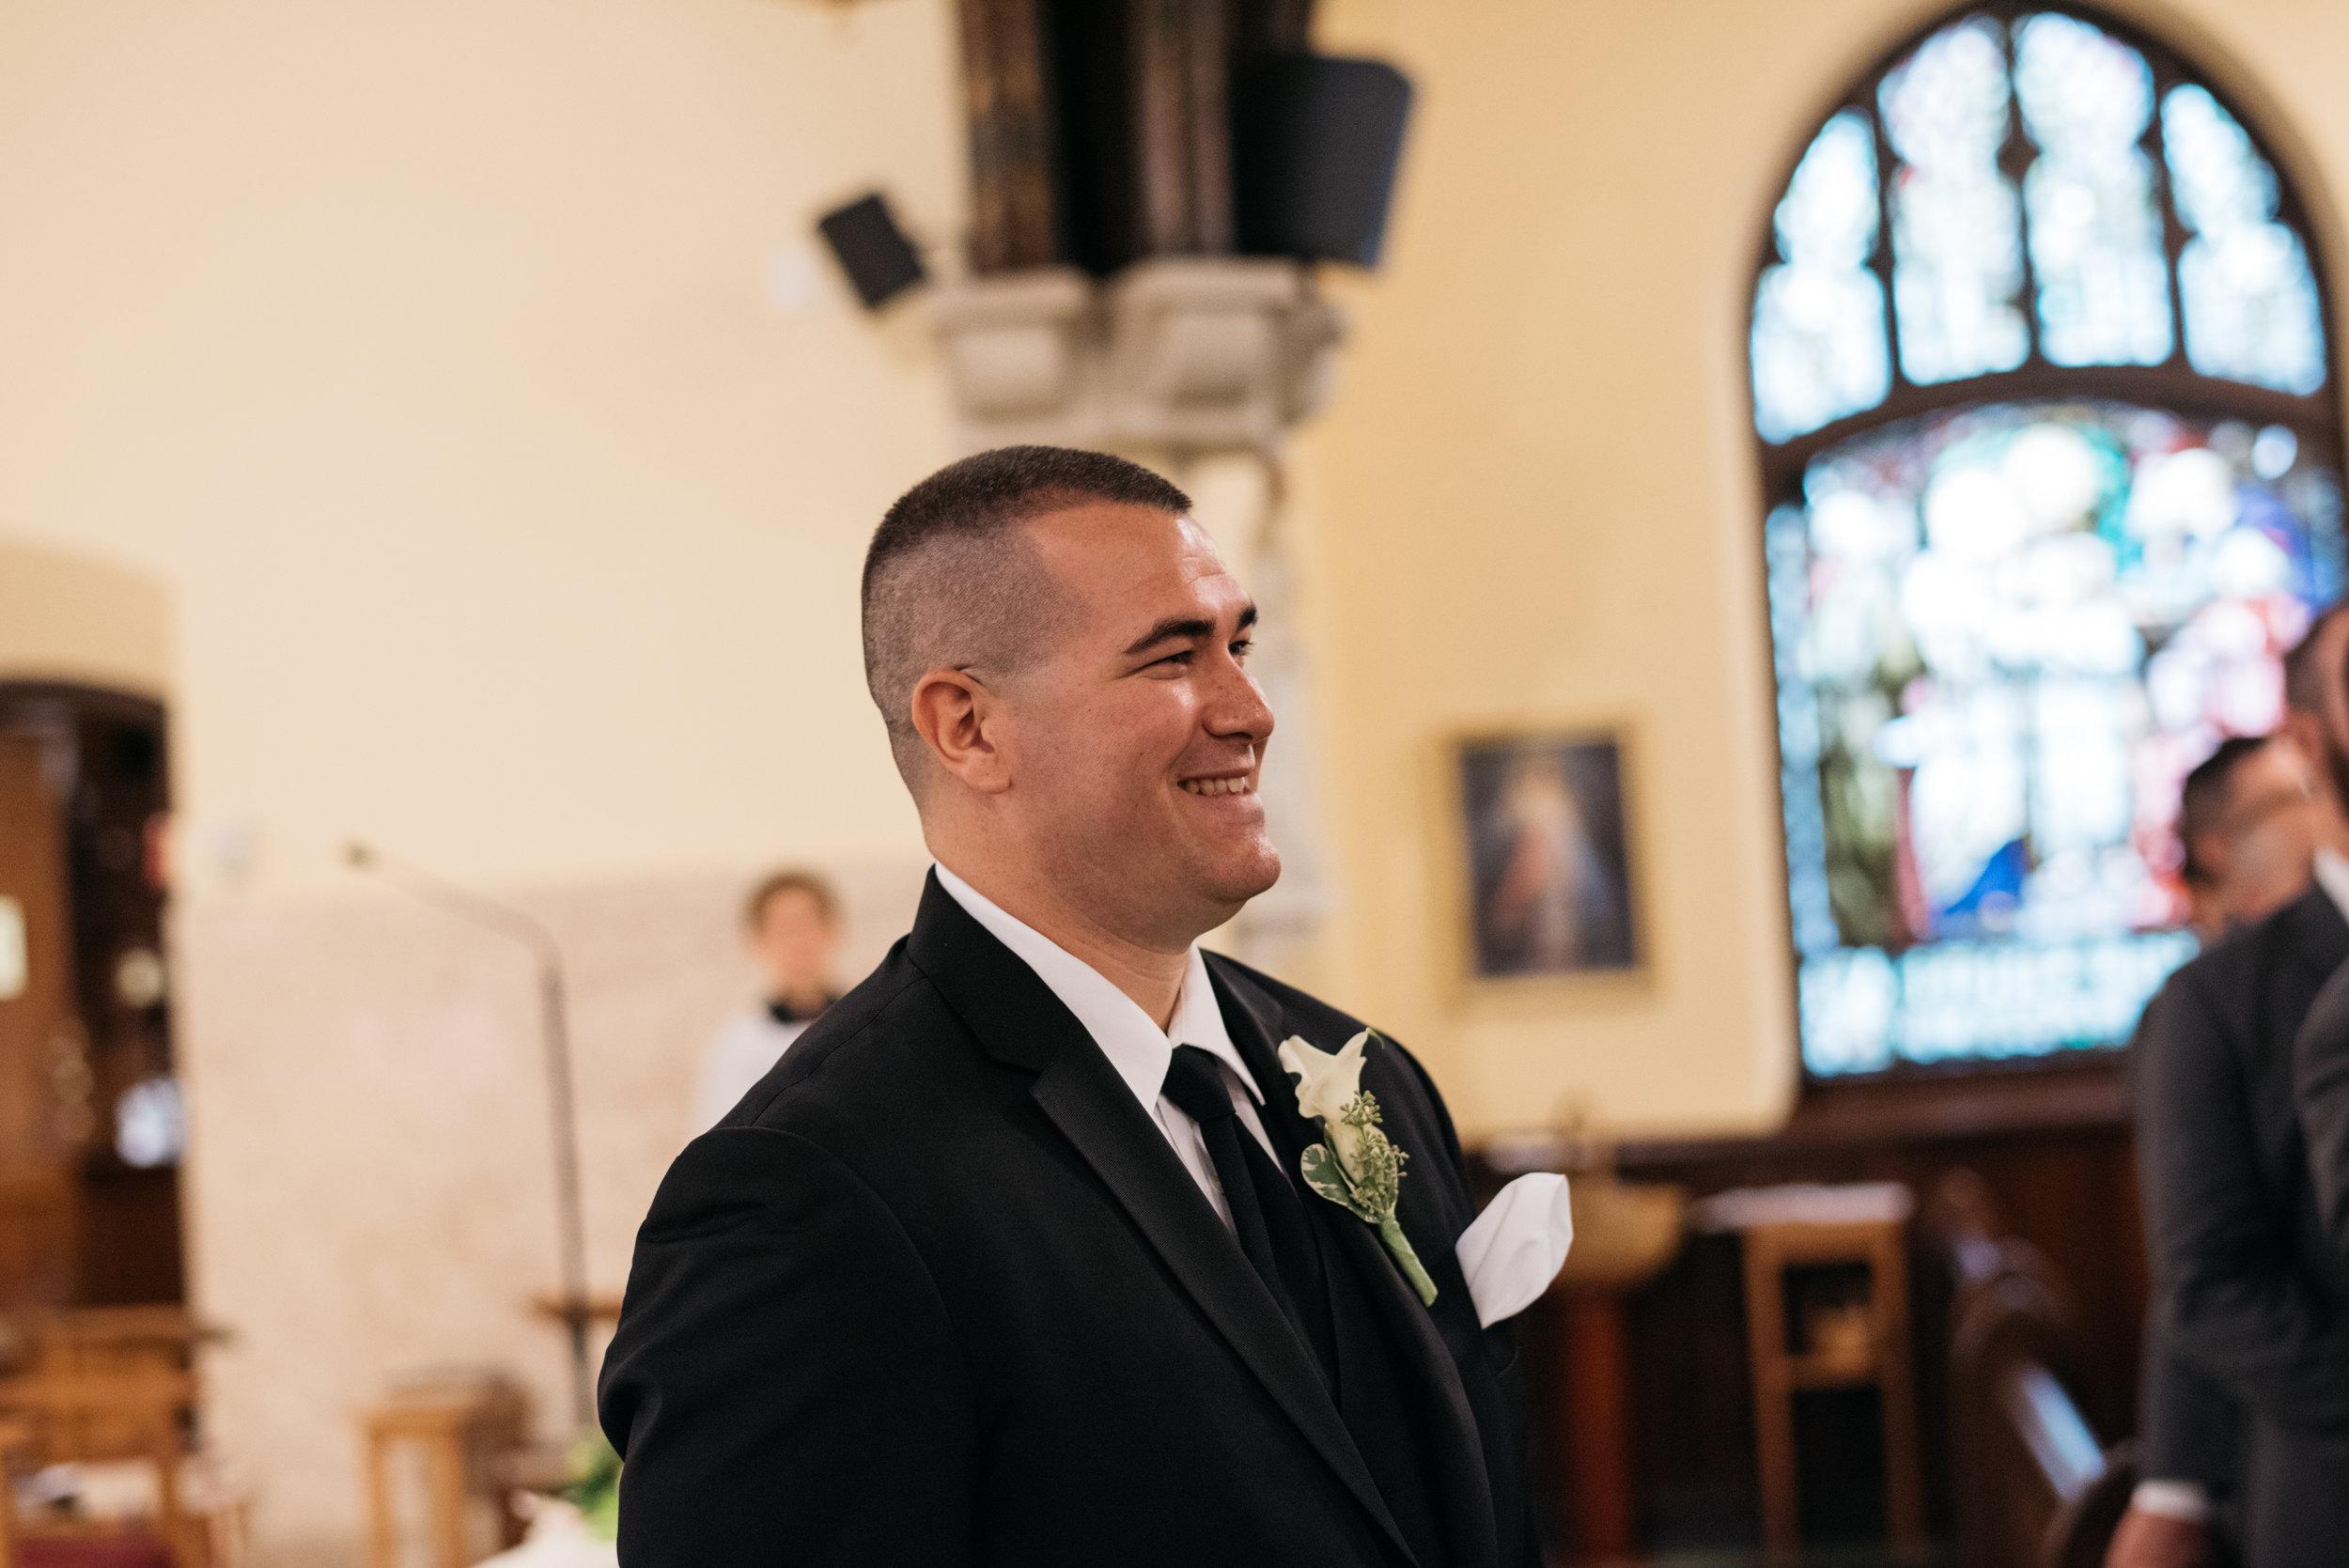 WeddingPhotos | NJPhotographer | Highlights-5-16.jpg